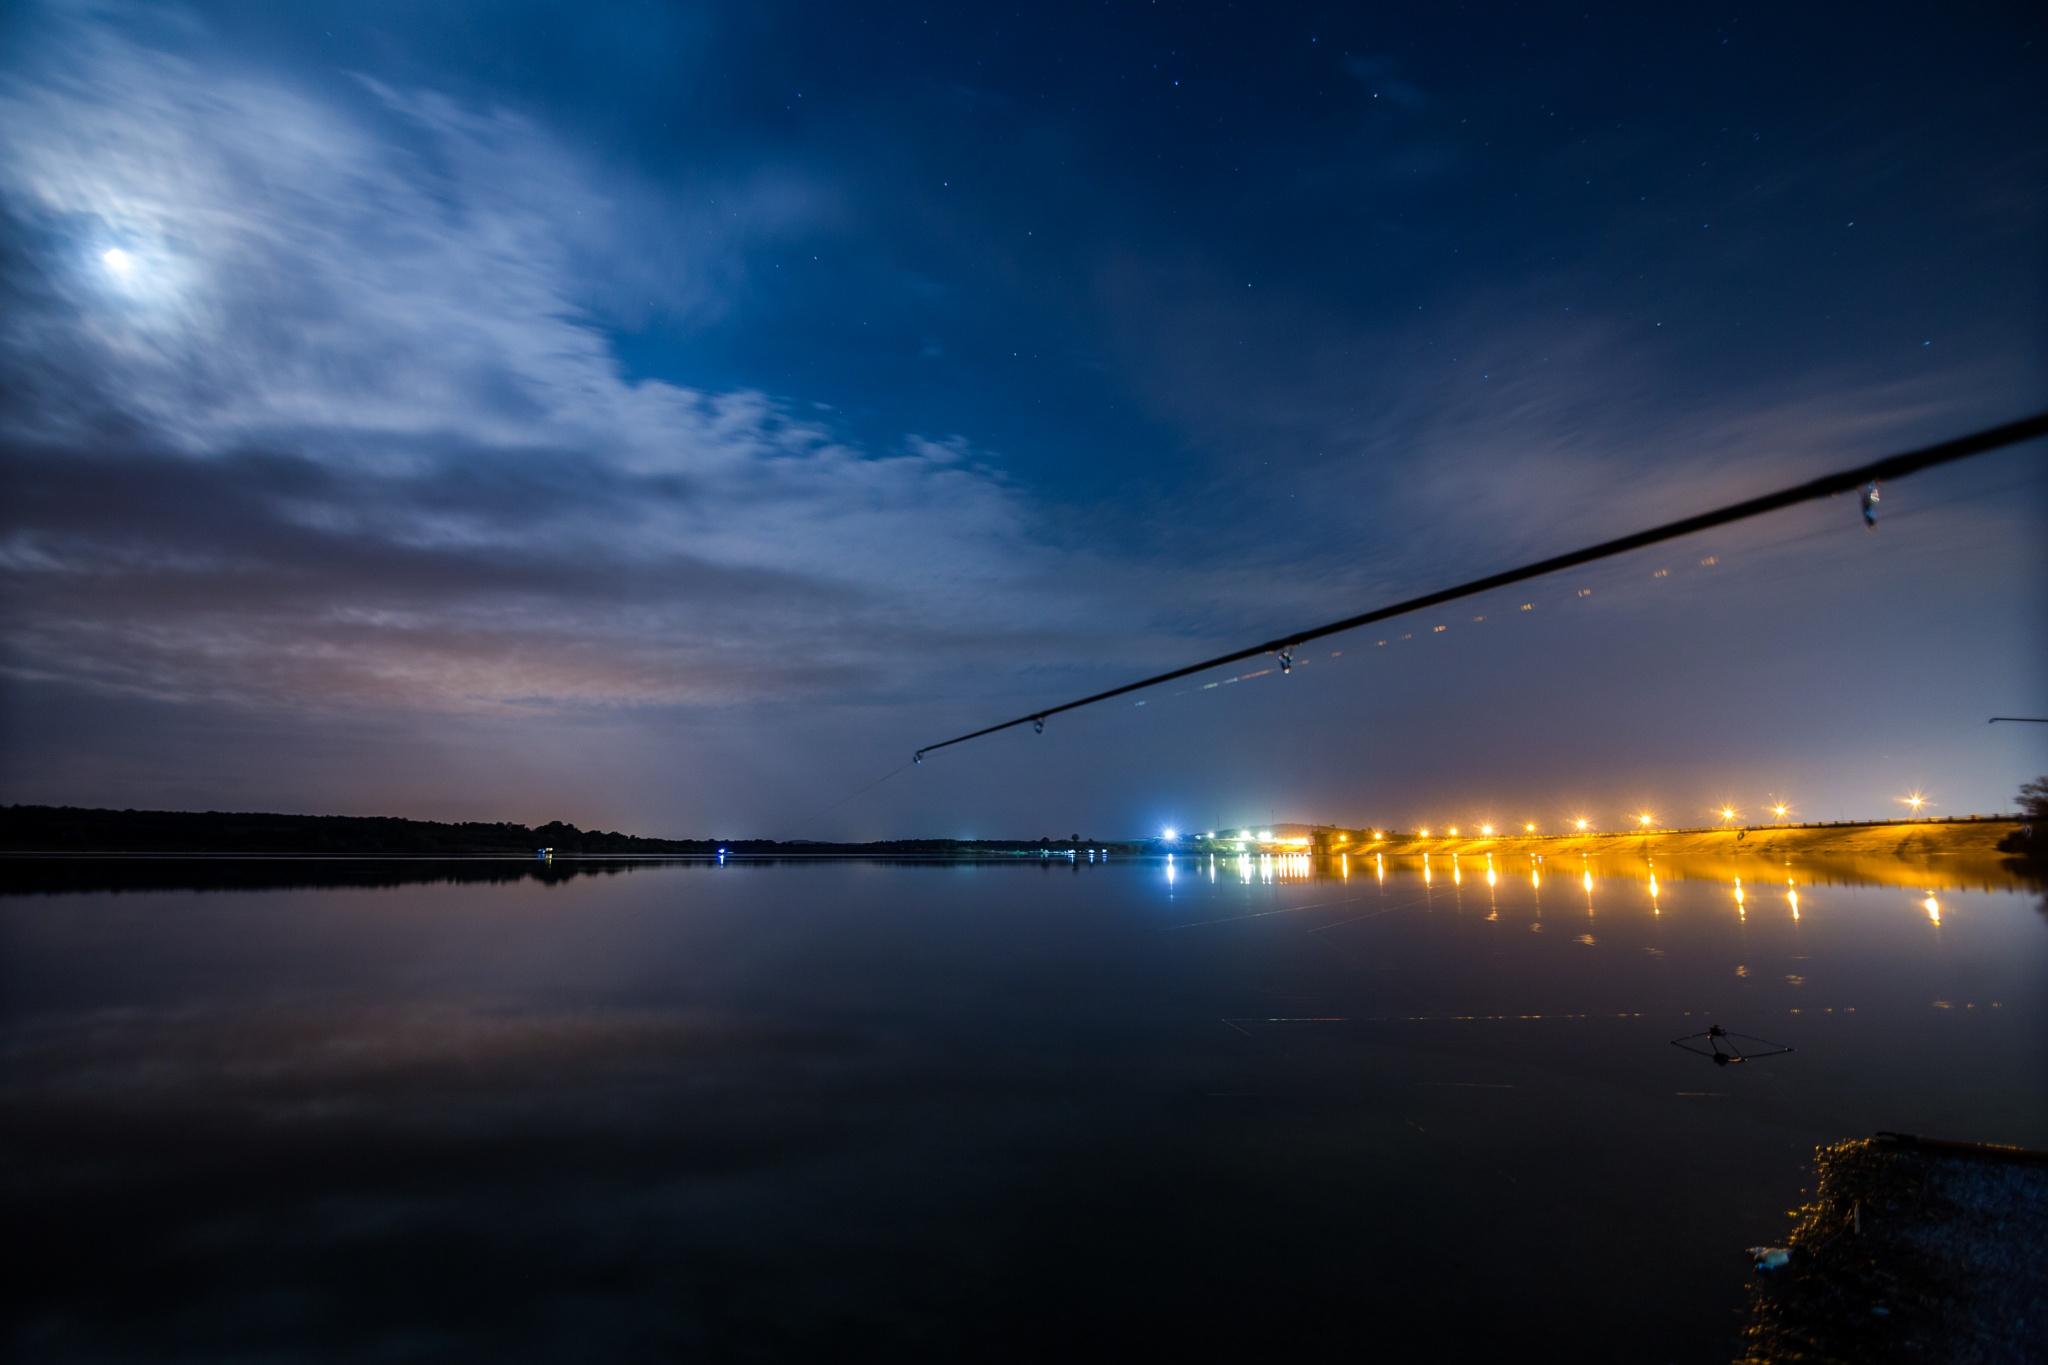 Fishing time by Anton Atanasov